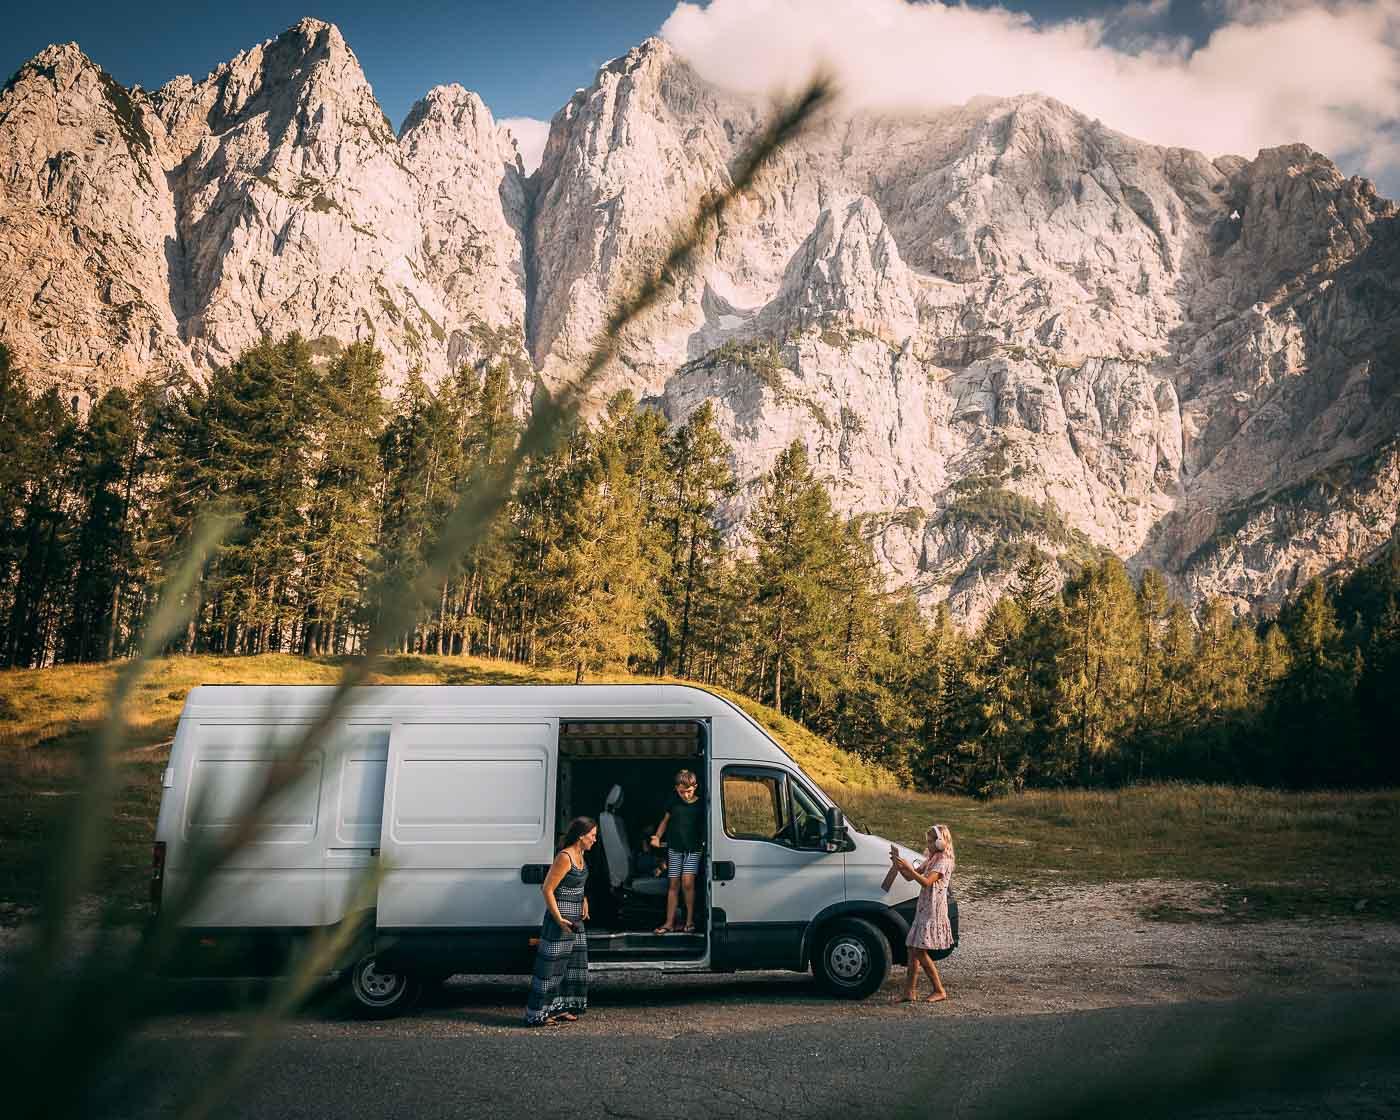 20190810-summer-2019-slovenia-IMG_0426